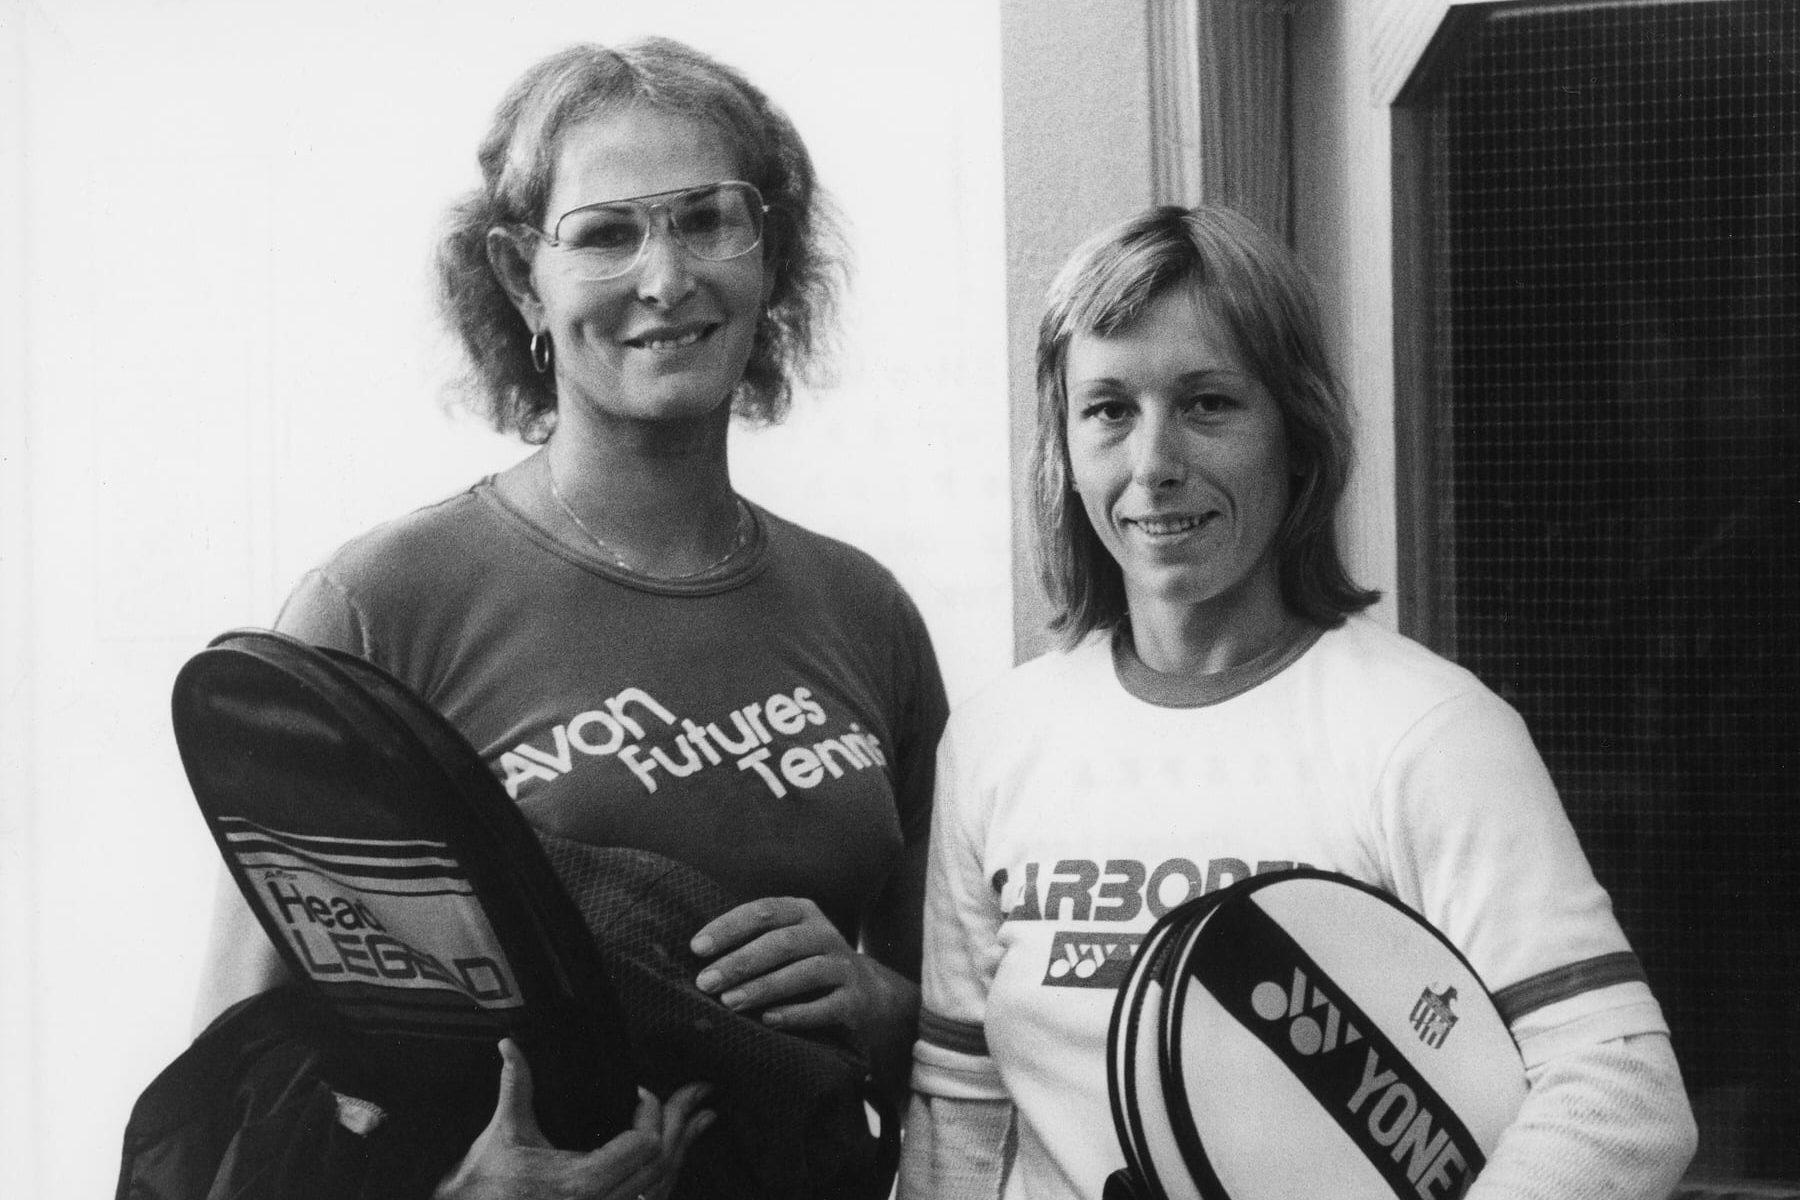 A vintage image of Renee Richards and Martina Navratilova holding tennis rackets.